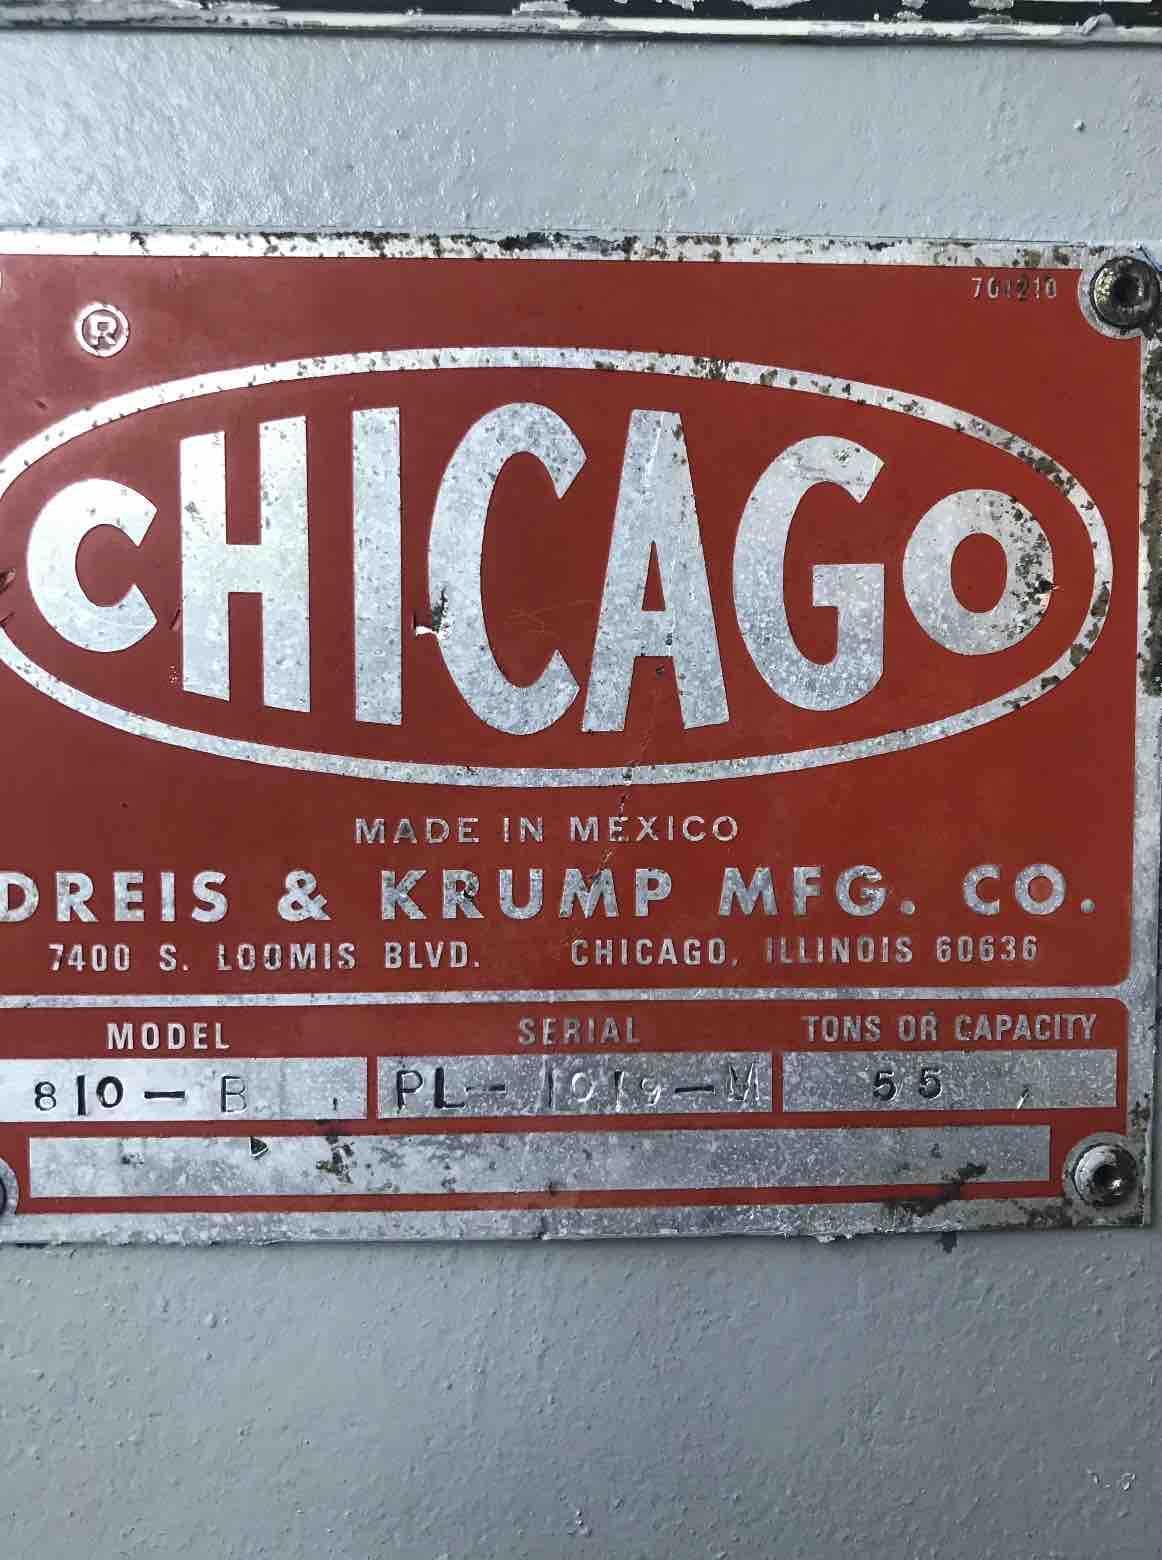 55 TON X 10' CHICAGO DRIES & KRUMP 810 B MECHANICAL PRESS BRAKE . STOCK # 0307621